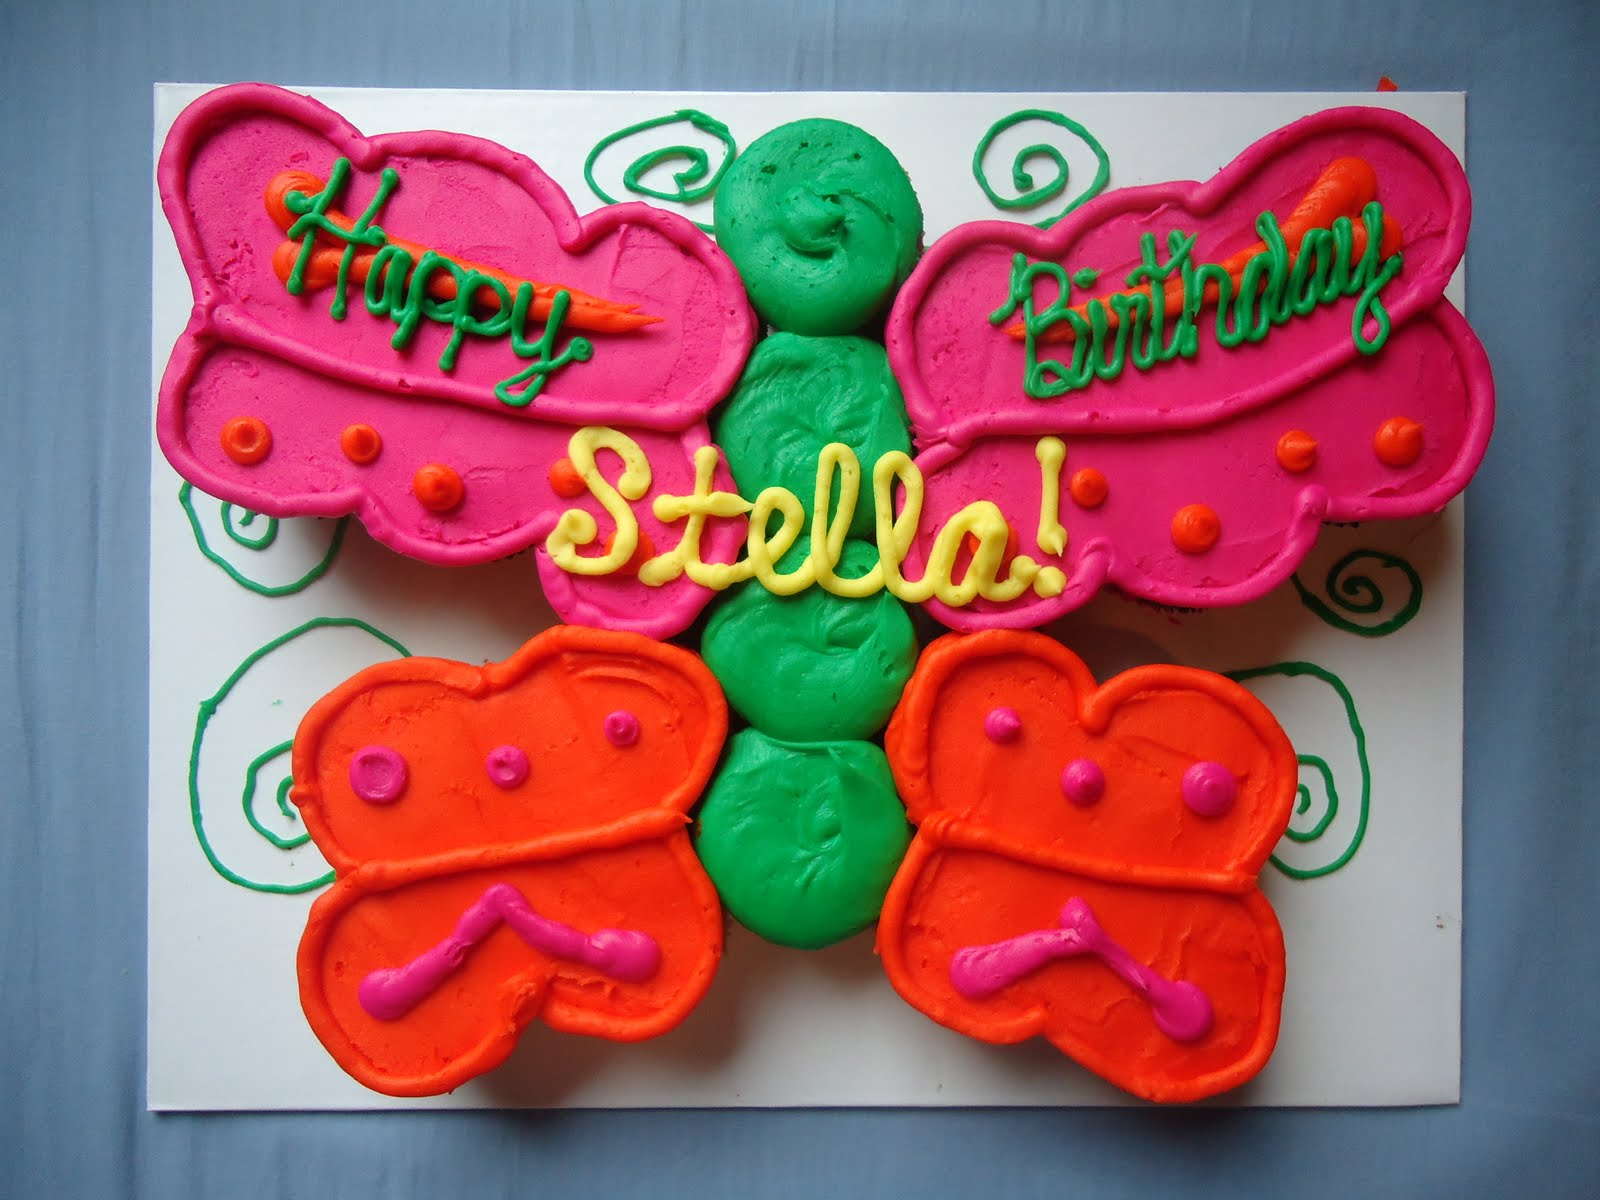 kraftykym Target bakery butterfly cake